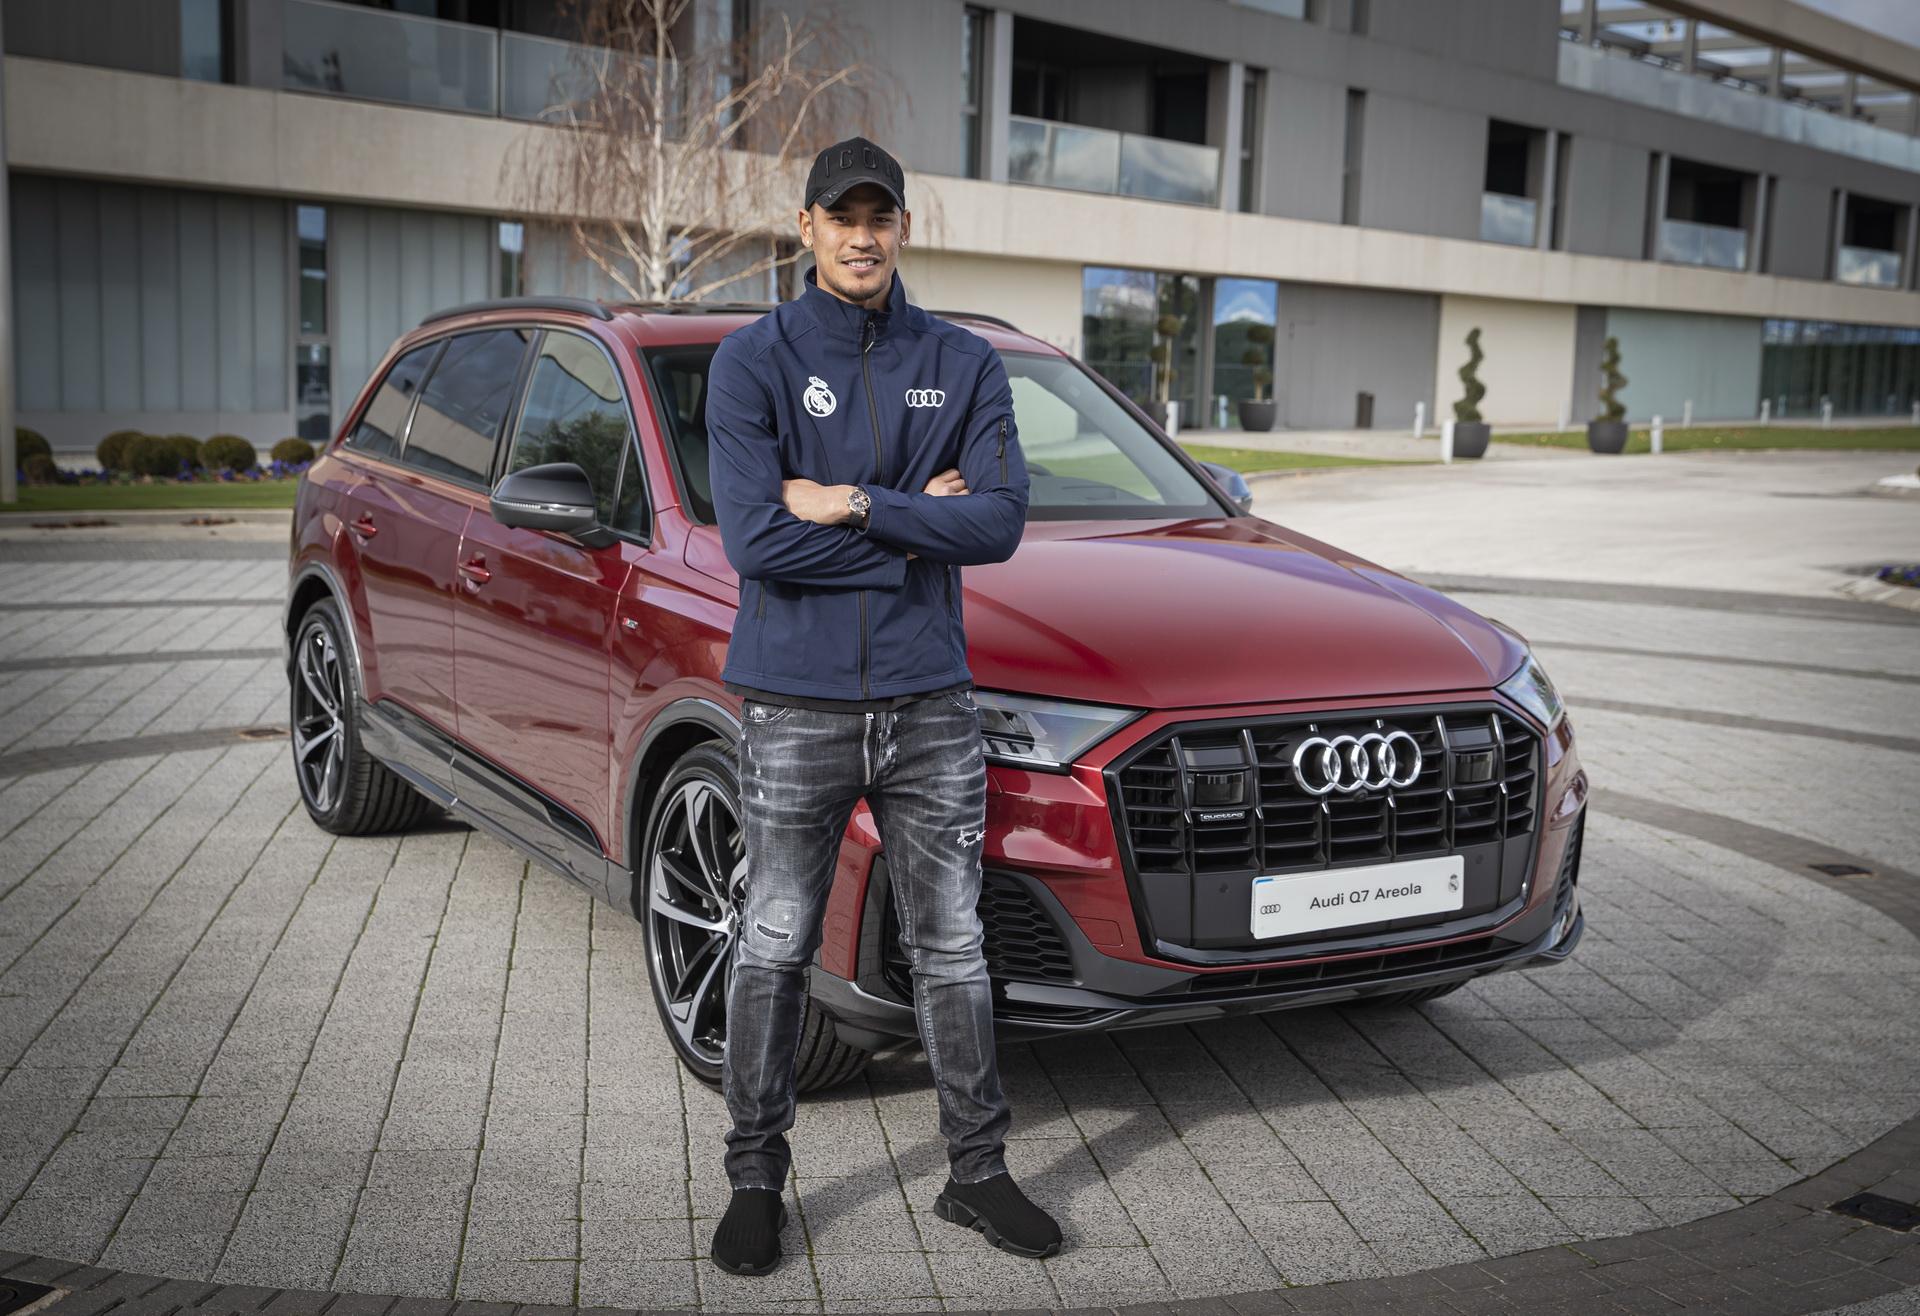 Real_Madrid_Players_Audi_0012